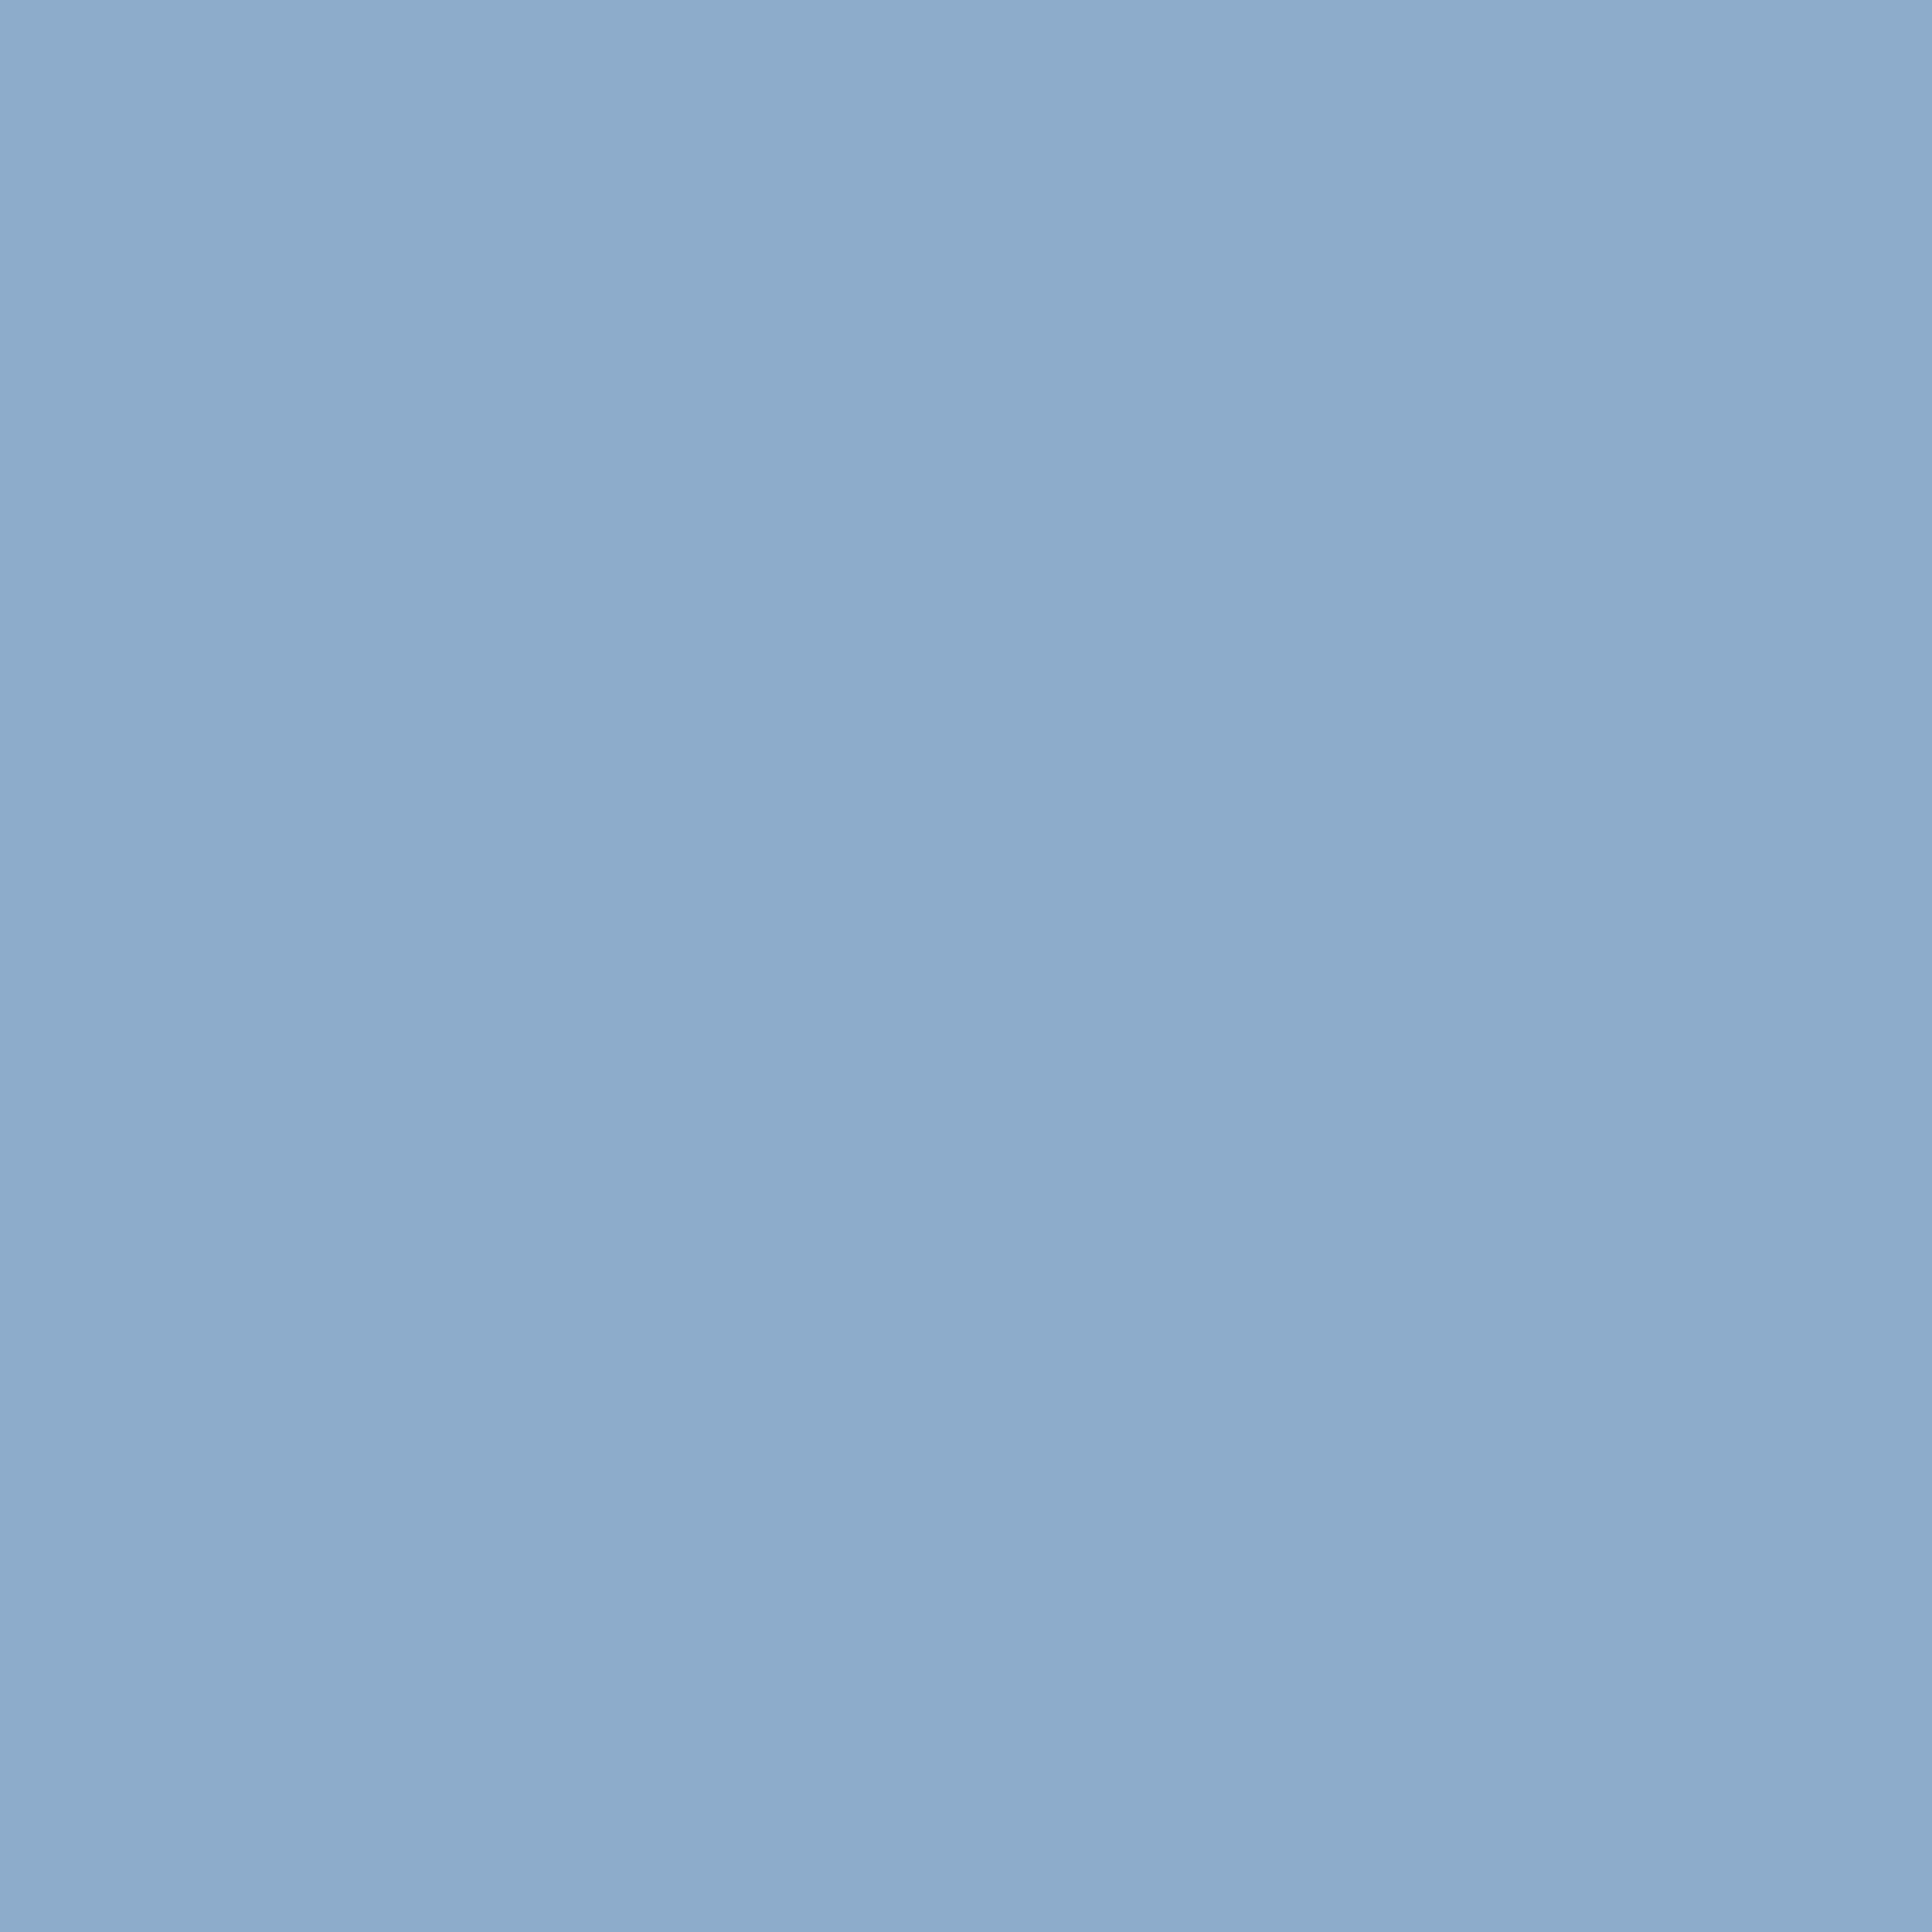 LT BLUE square.jpg